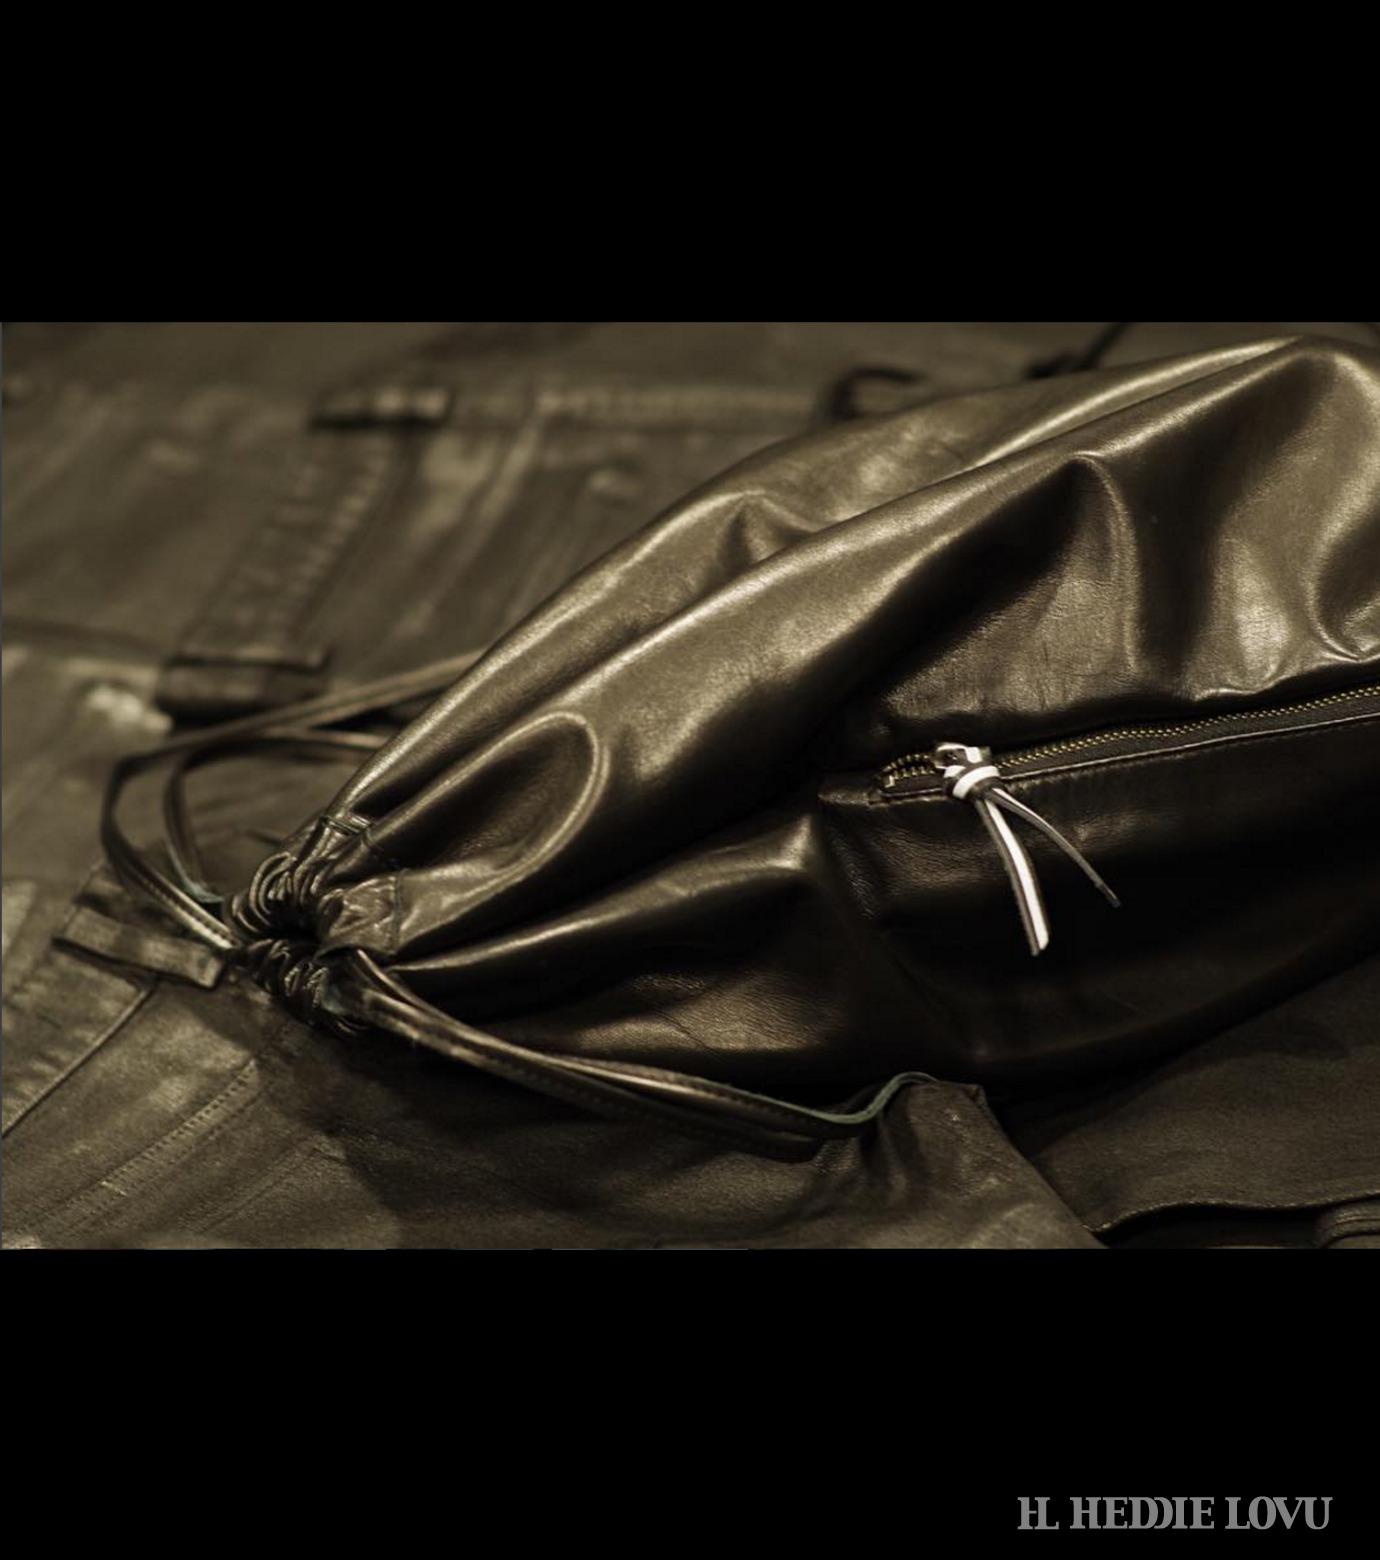 HL HEDDIE LOVU(エイチエル・エディールーヴ)のLEATHER KNAP SAC-BLACK(バッグ/bag)-17A900008-13 拡大詳細画像5